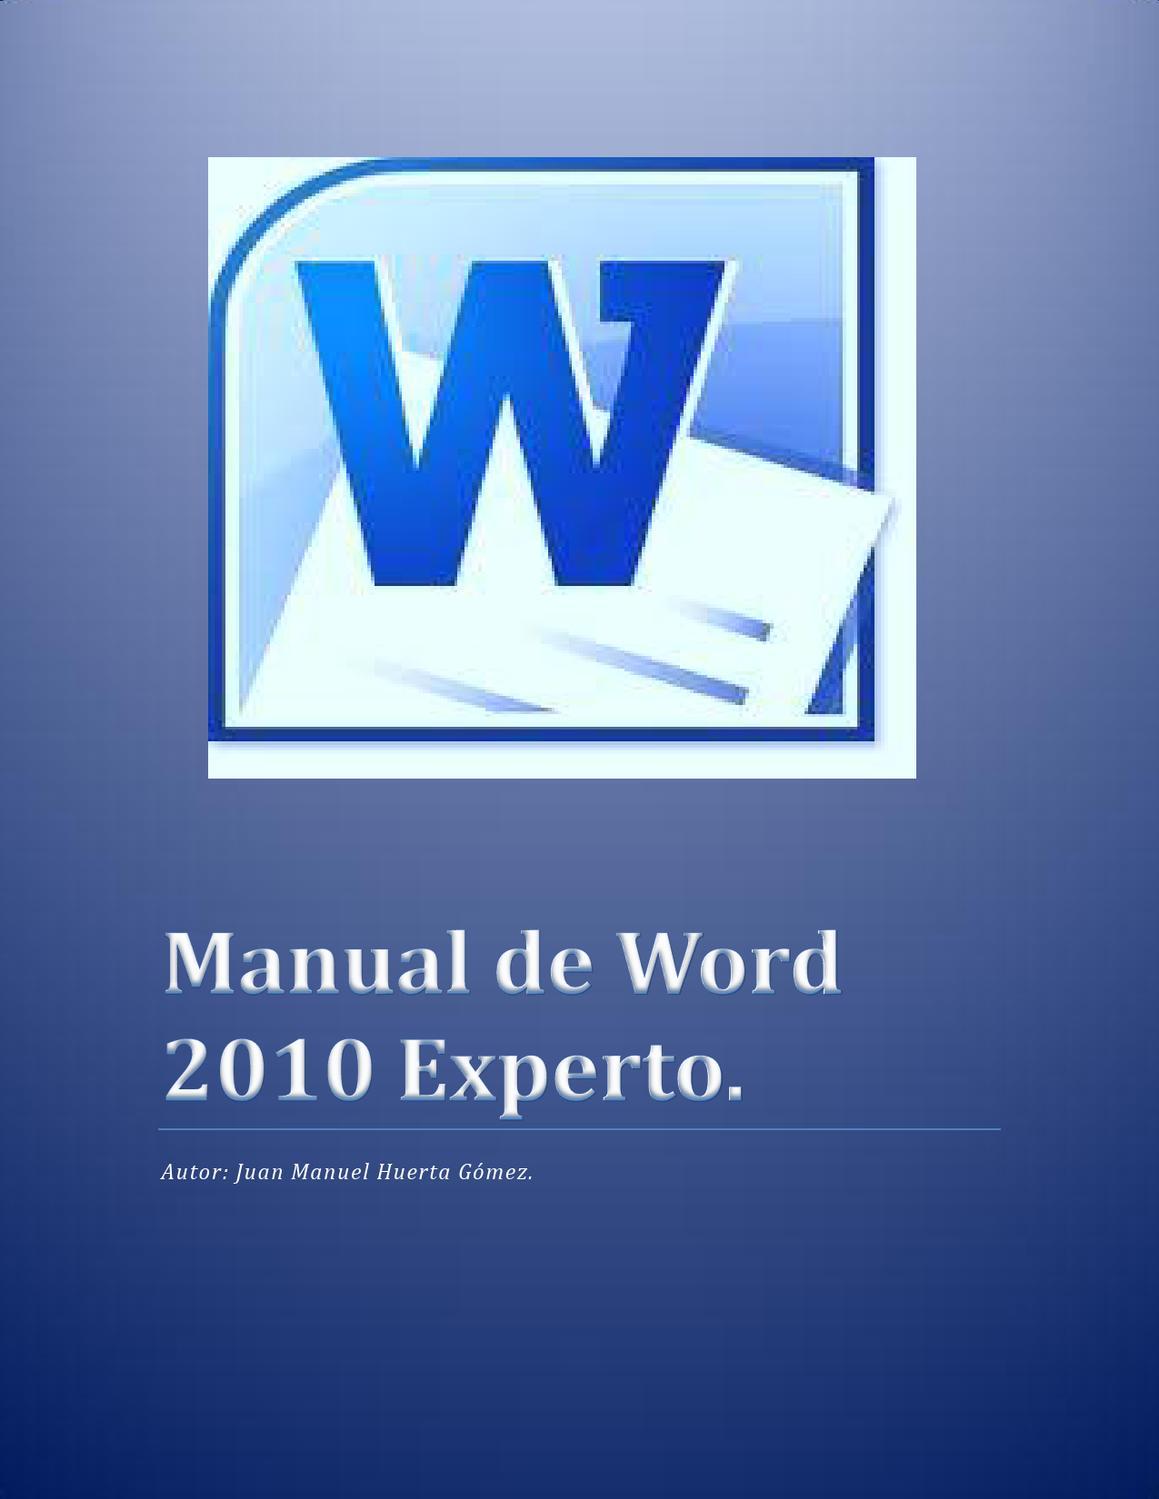 MANUAL DE WORD by JUAN MANUEL HUERTA GOMEZ - issuu